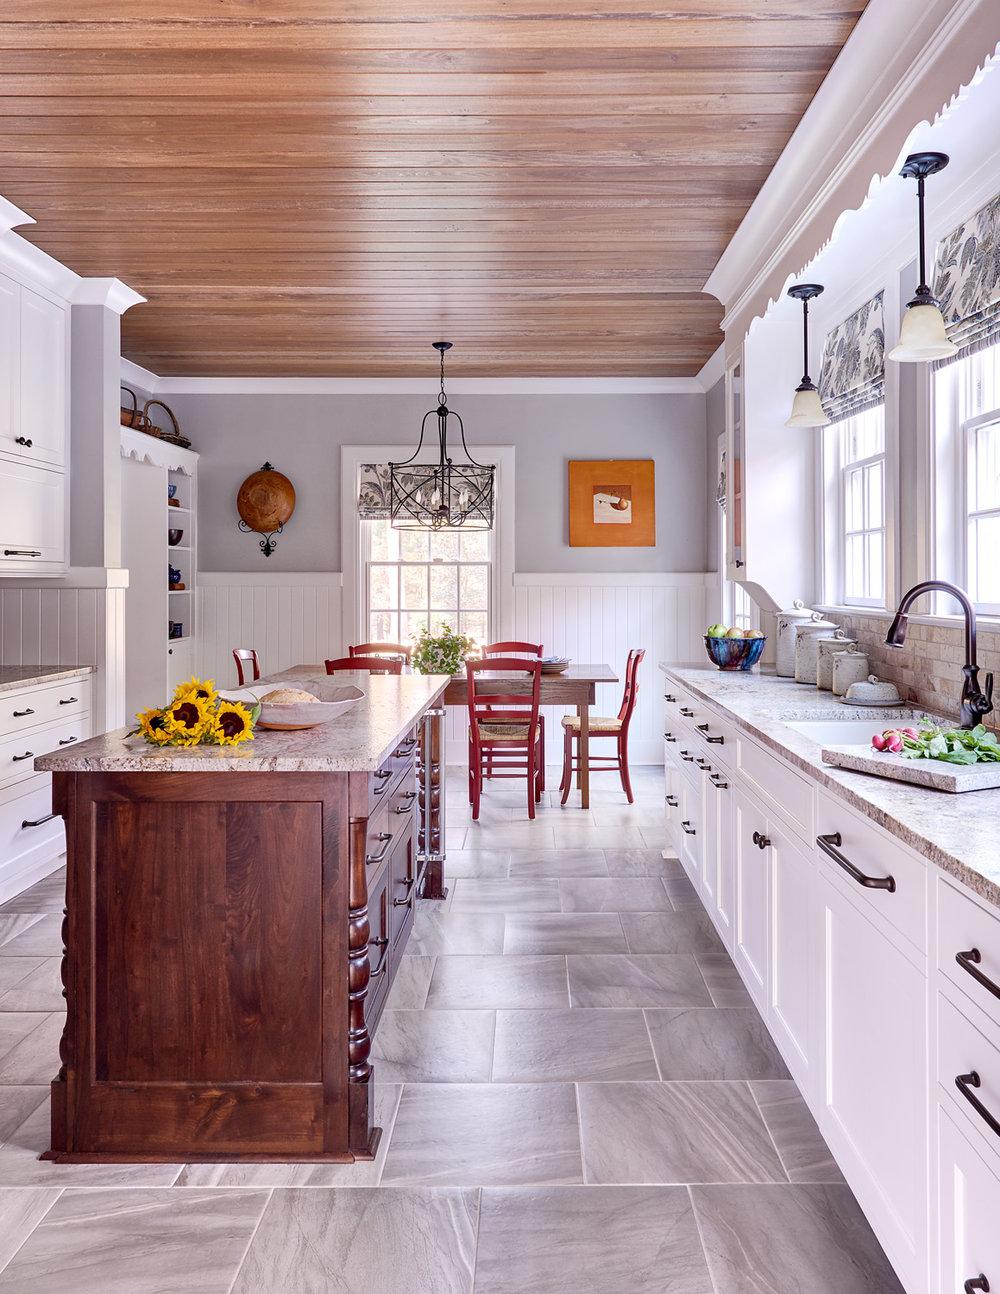 interior-design-kitchen-north-carolina-3.jpg